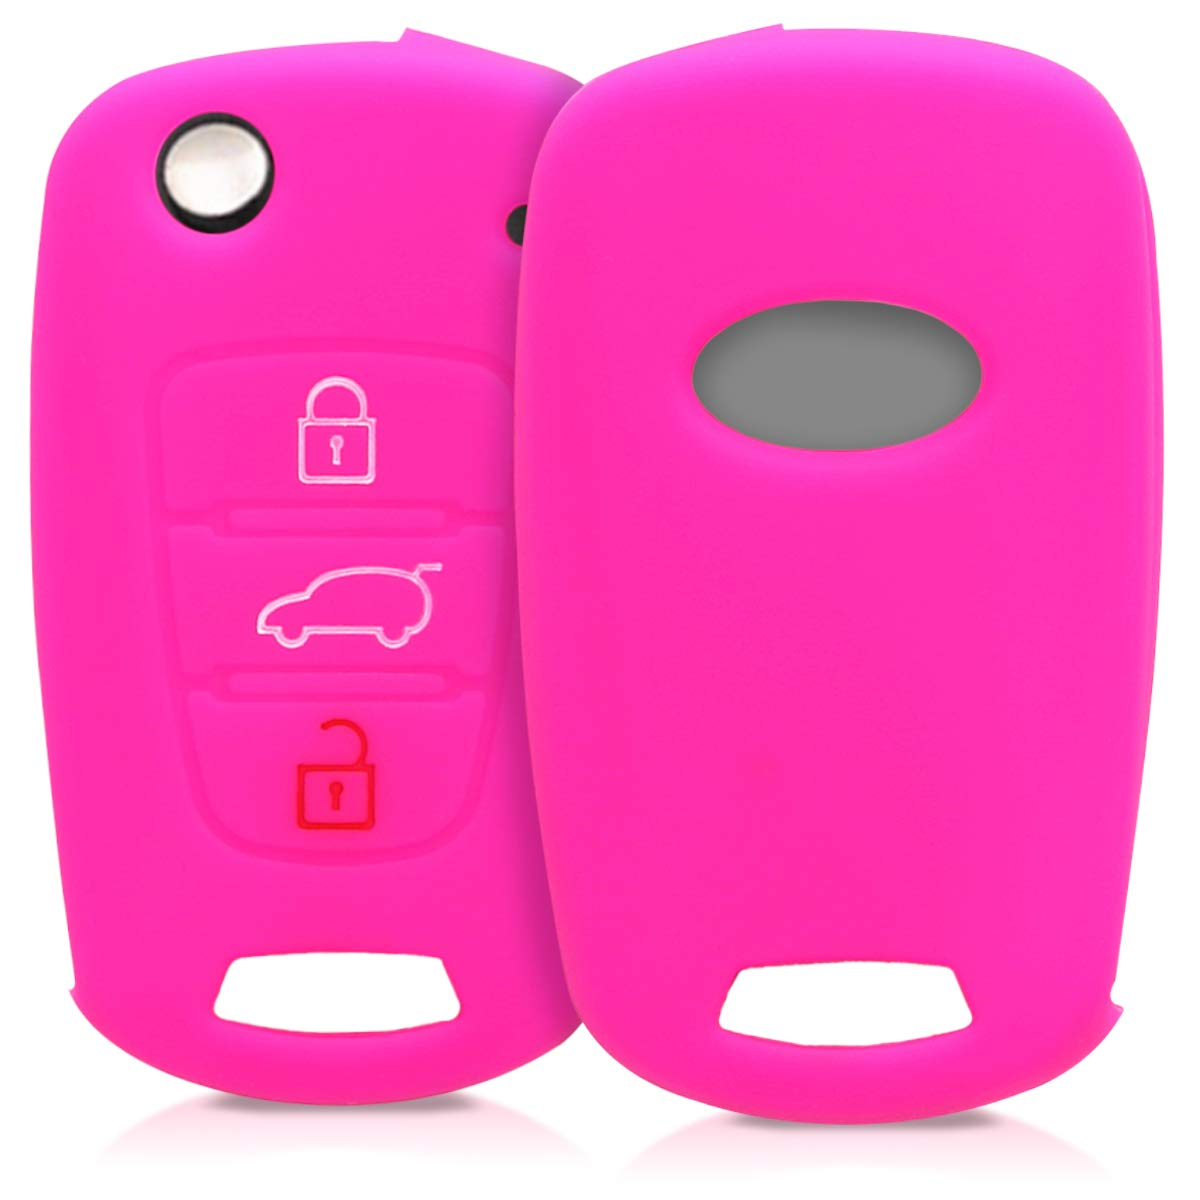 kwmobile Car Key Cover for Kia - Silicone Protective Key Fob Cover for Kia 3 Button Car Flip Key - White/Black